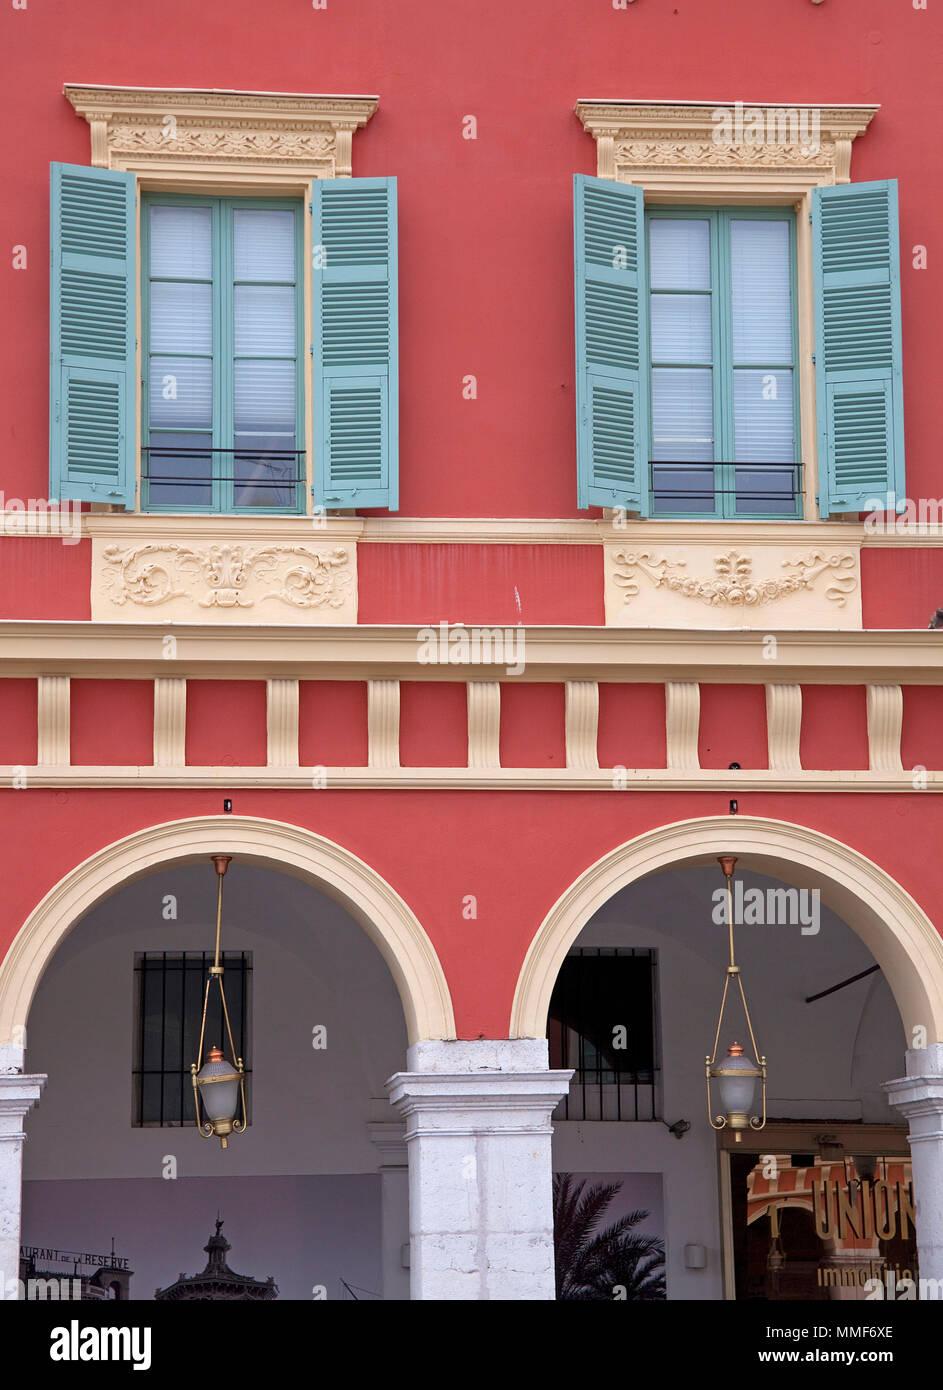 Facade of shopping center Lafayette, Place Masséna, Nice, Côte d'Azur, Alpes-Maritimes, South France, France, Europe Stock Photo